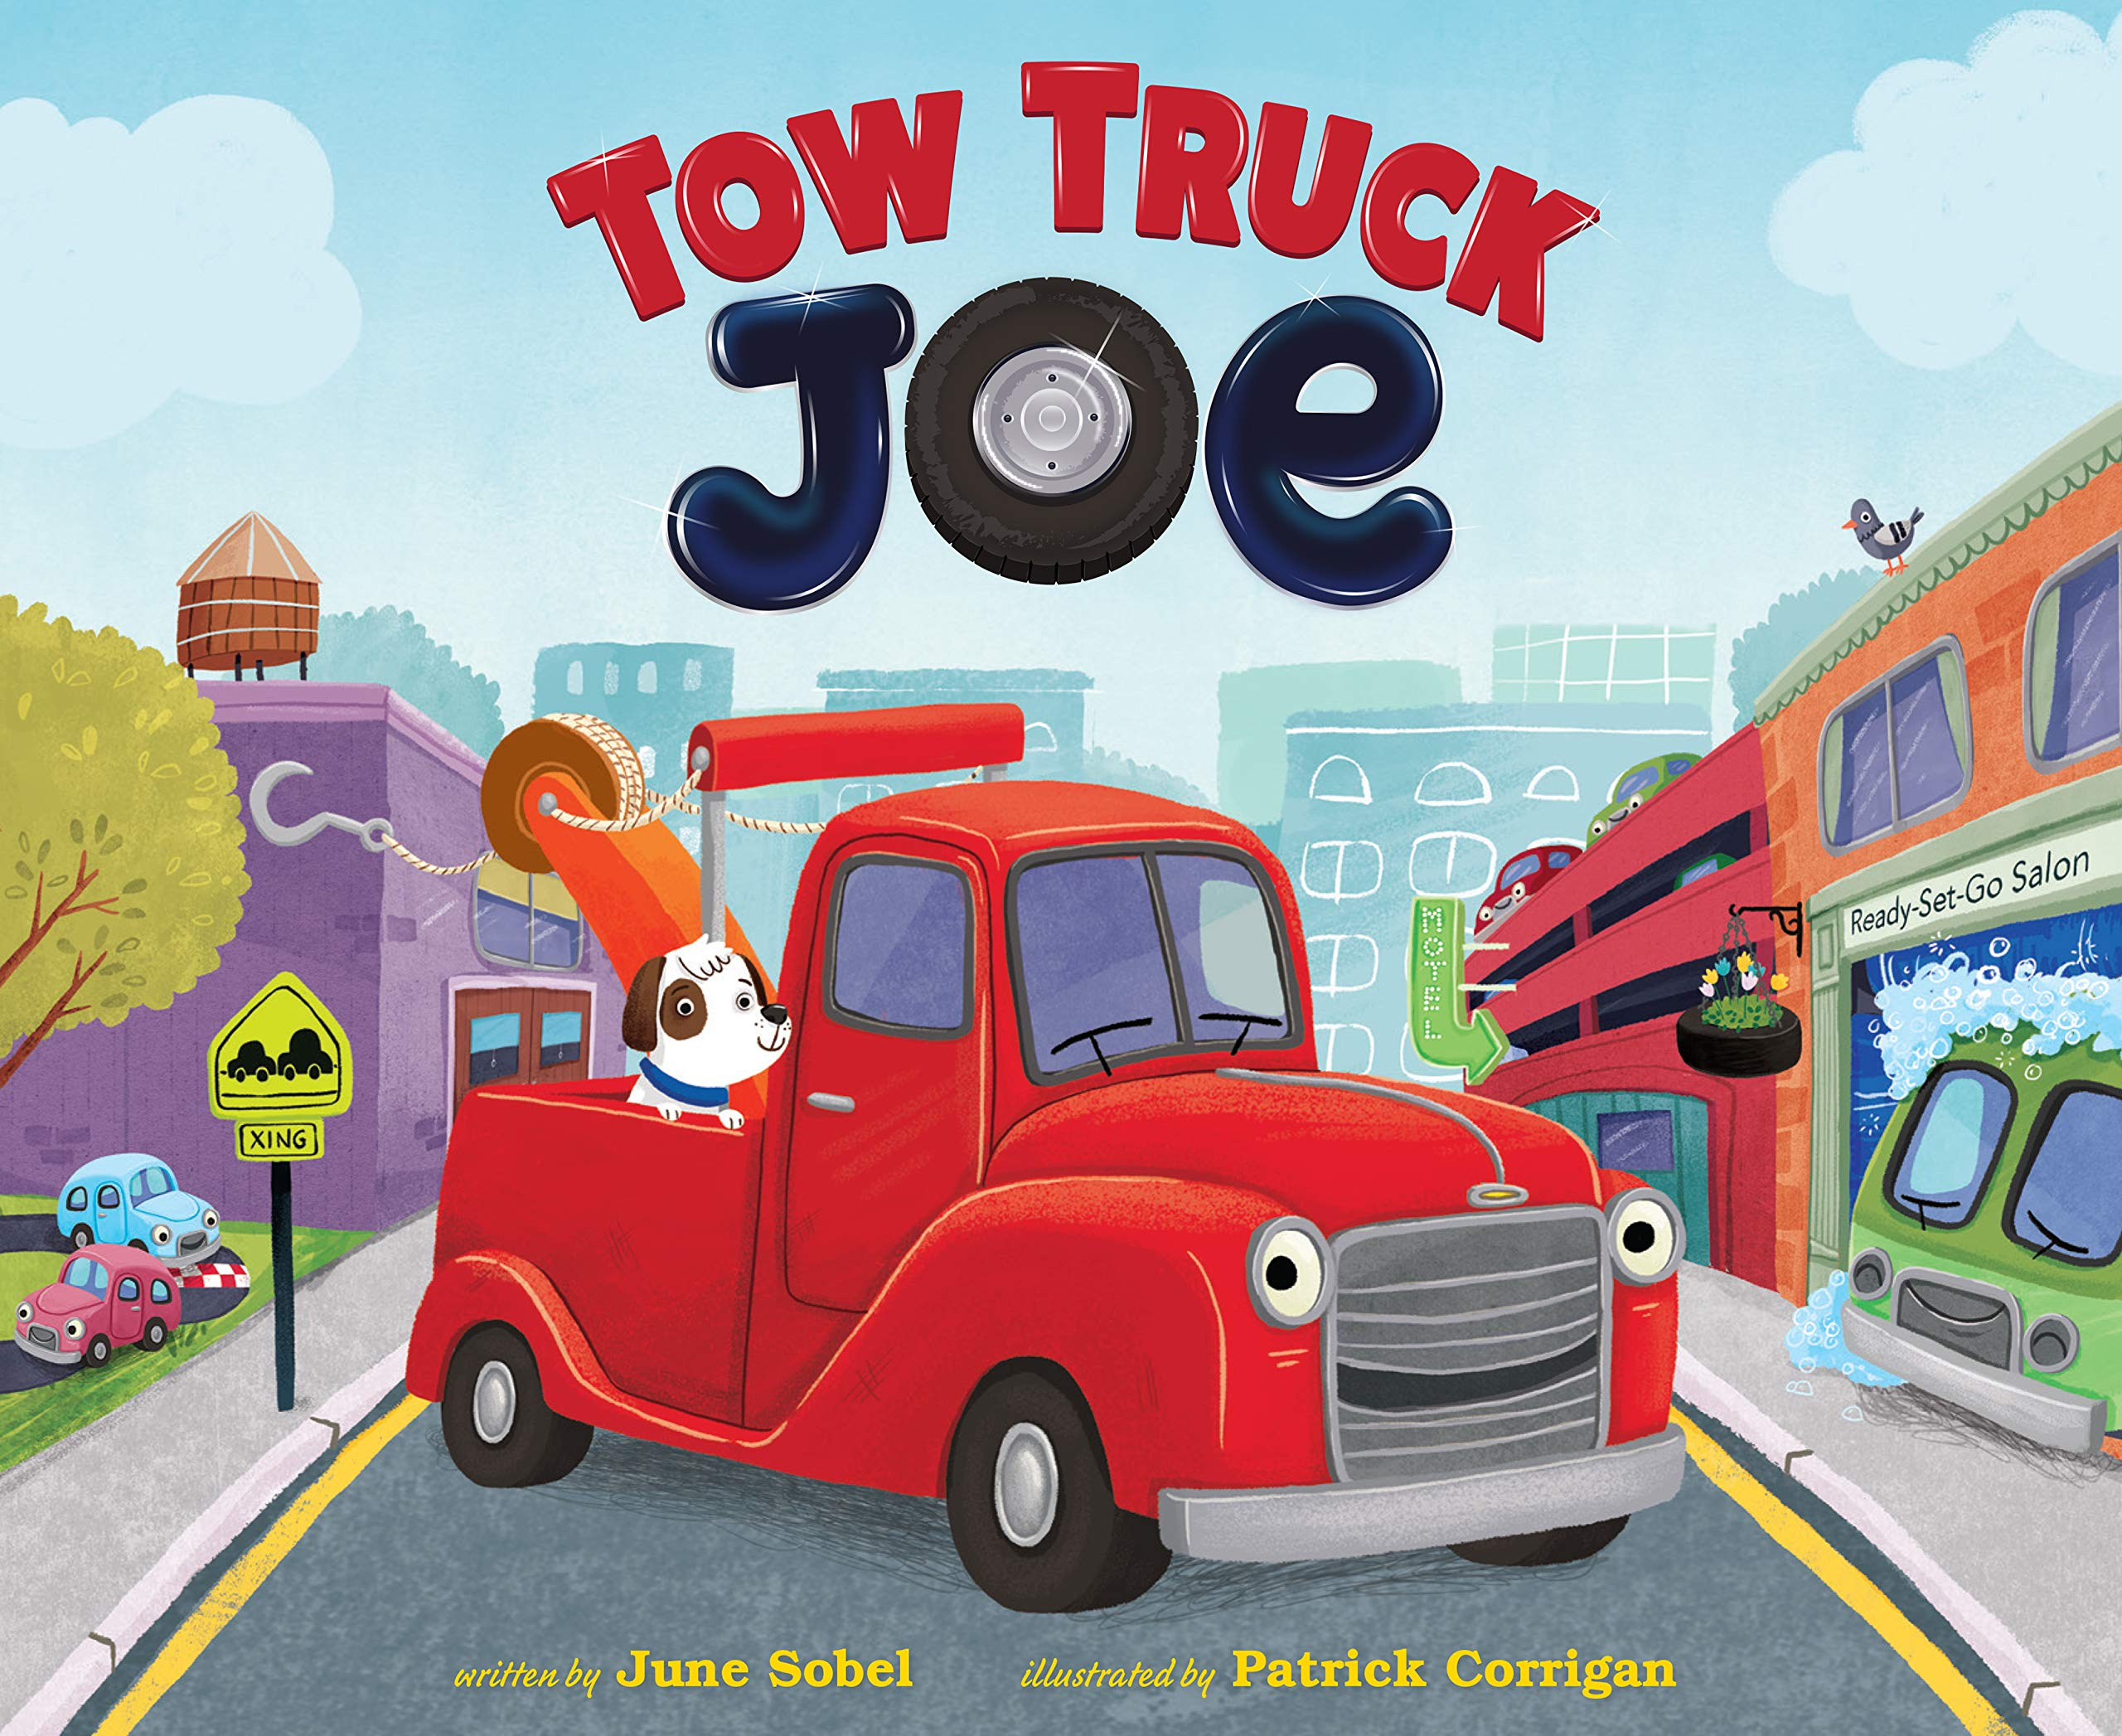 amazon com tow truck joe 9780358053125 sobel june corrigan patrick books amazon com tow truck joe